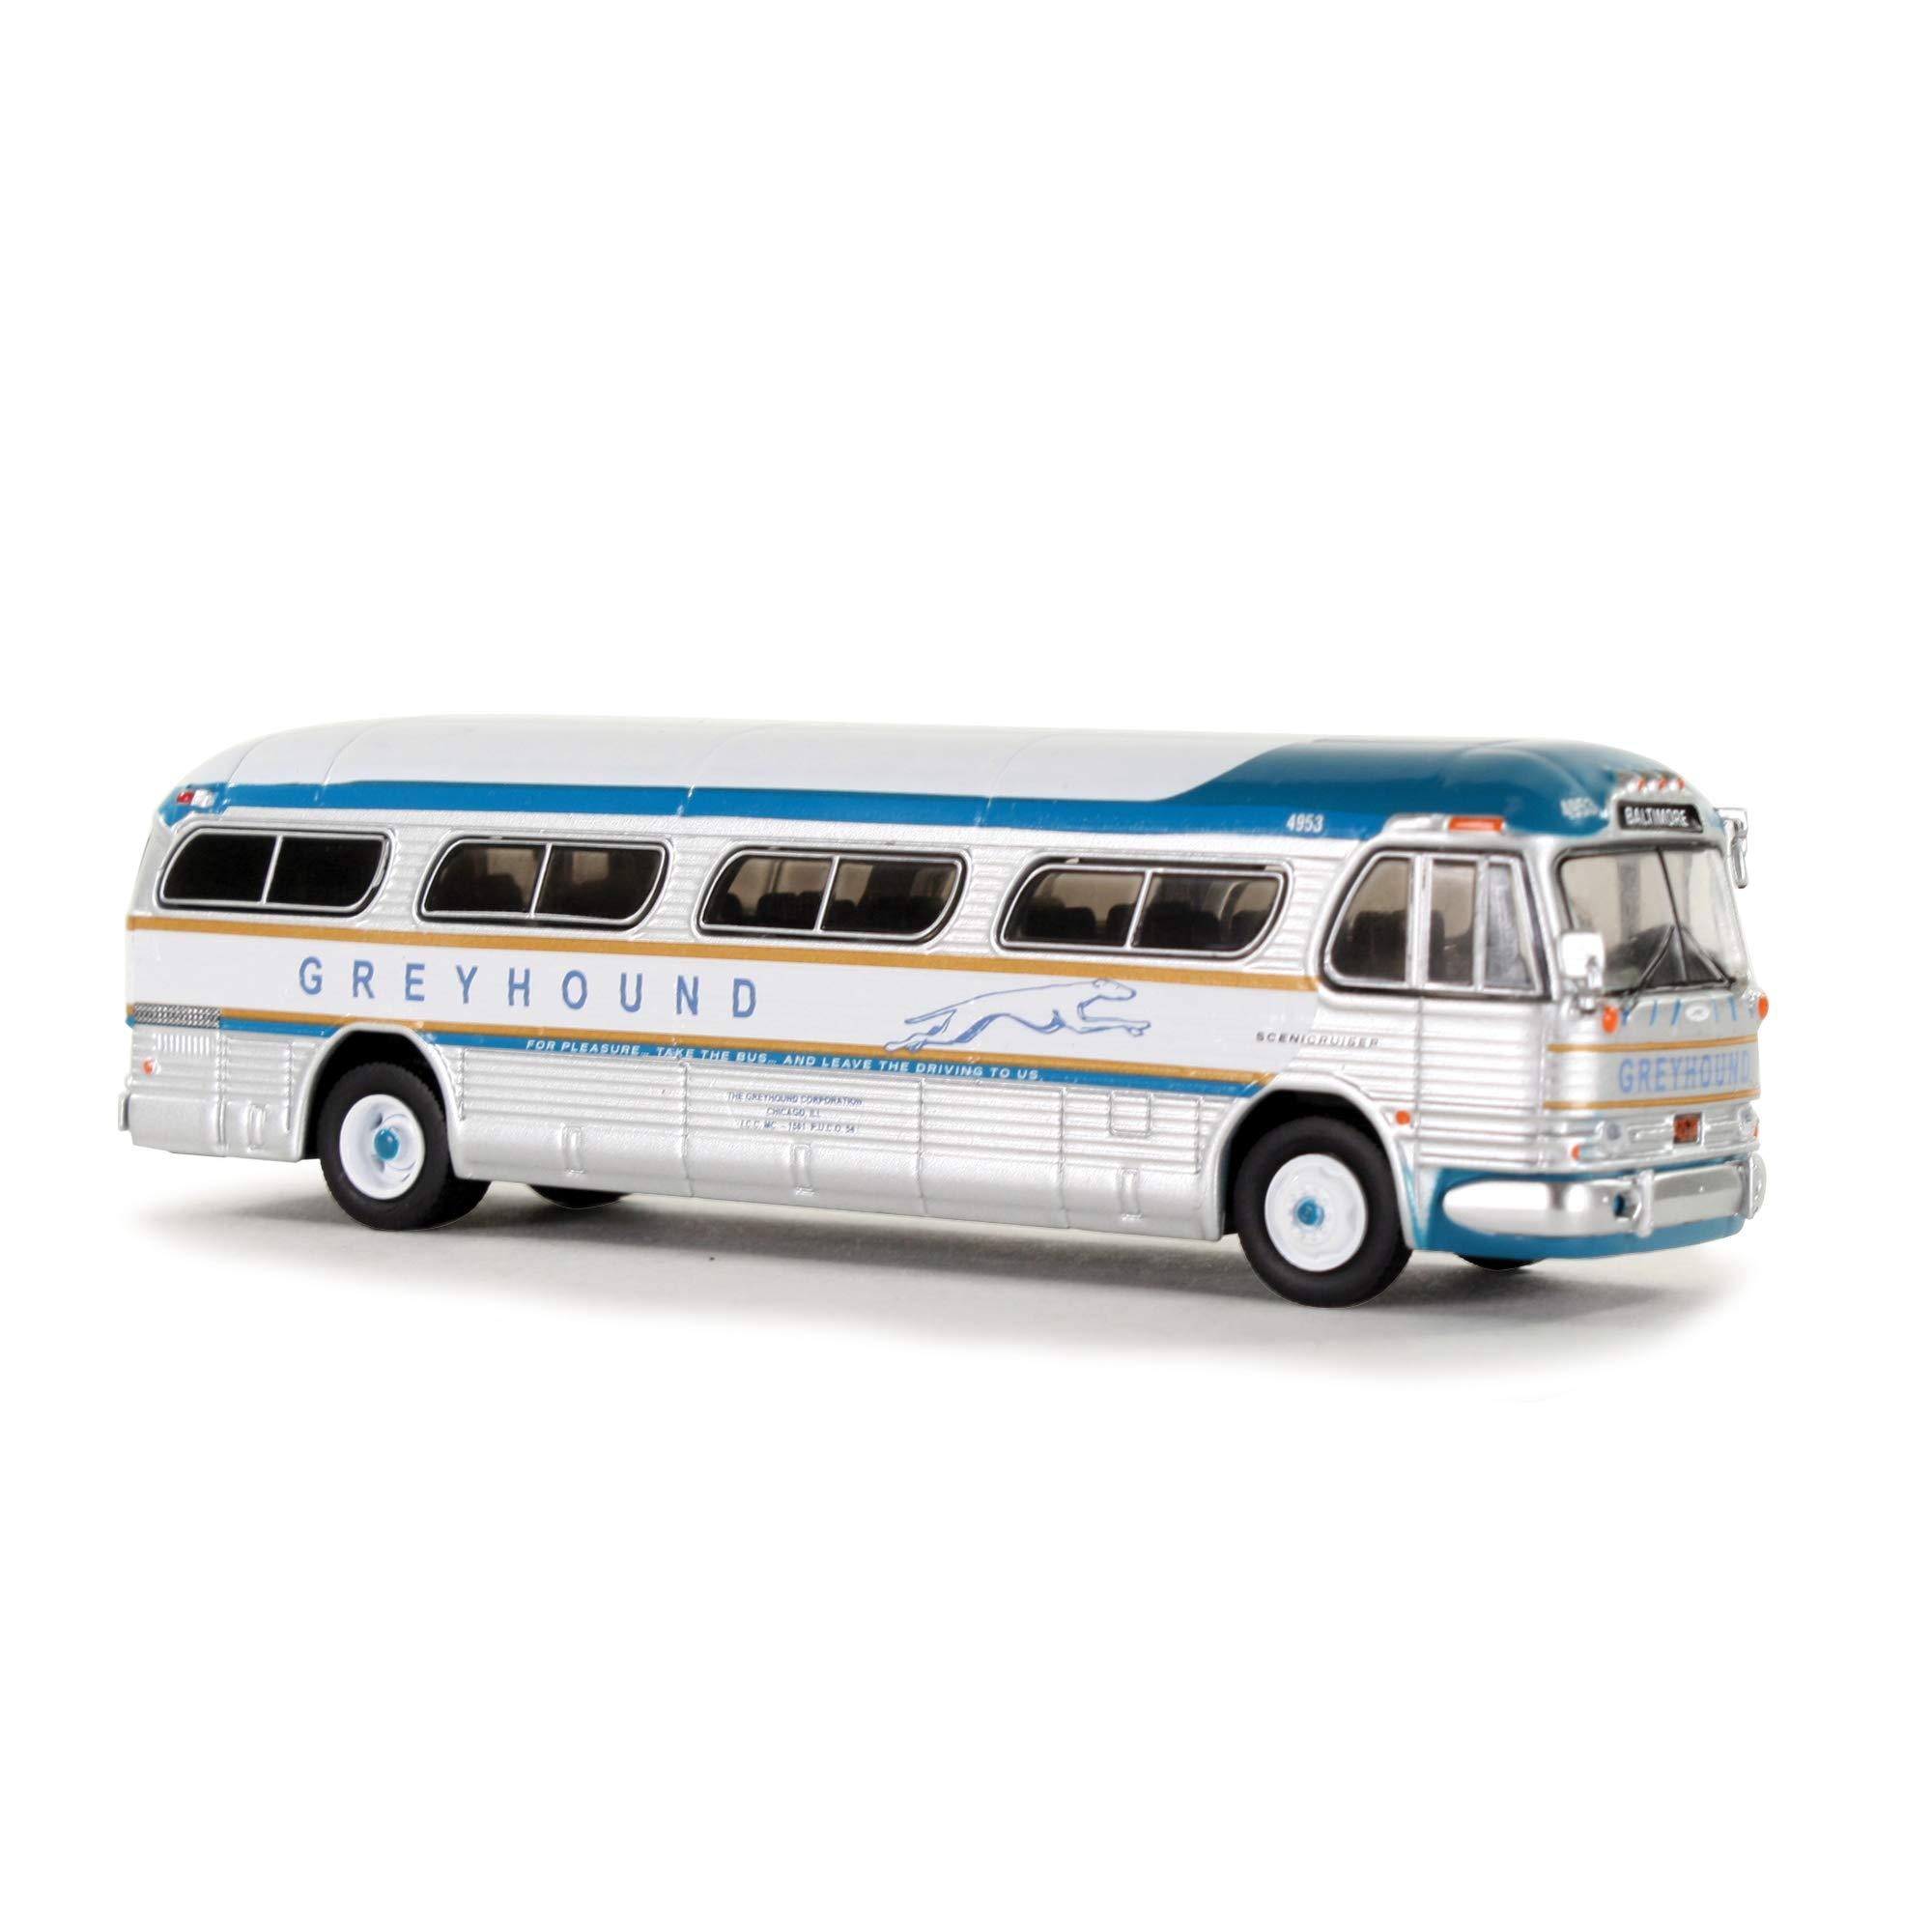 1959 GM PD4104 Motorcoach Greyhound Golden Scheme (Baltimore, Maryland) Greyhound 50th Anniversary 1/87 Diecast Model by Iconic Replicas 87-0145